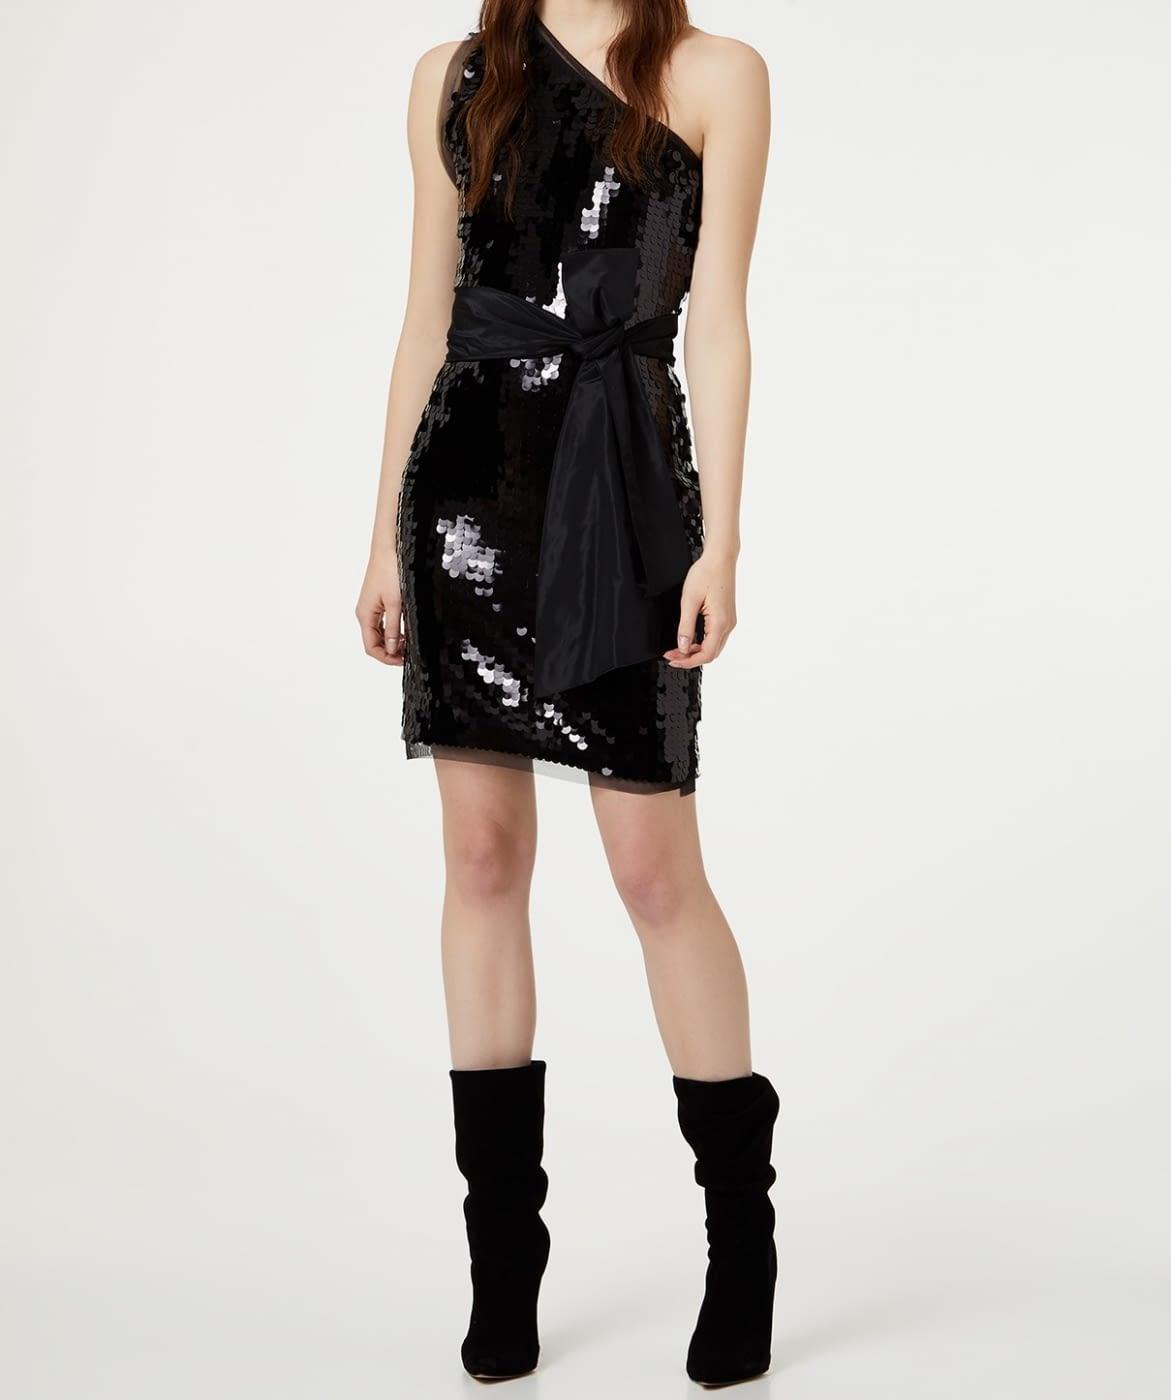 LIU.JO vestido asimétrico con paillete color negro